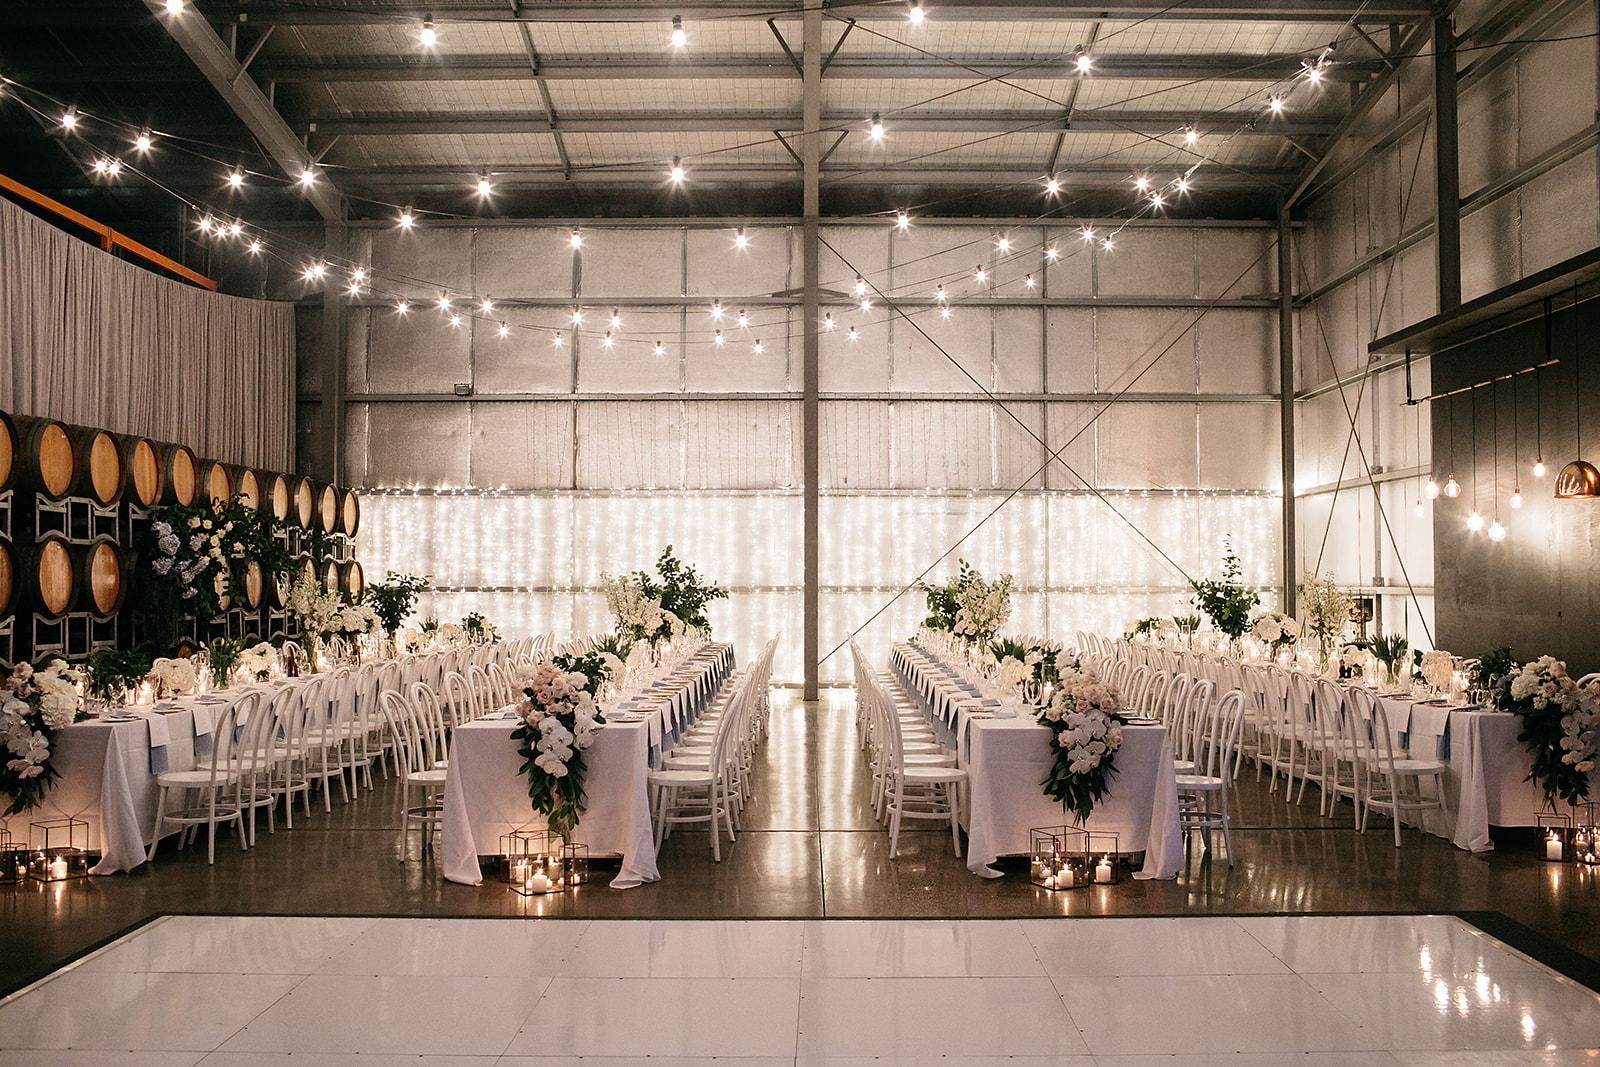 Dancing & Dessert - Melbourne winery wedding